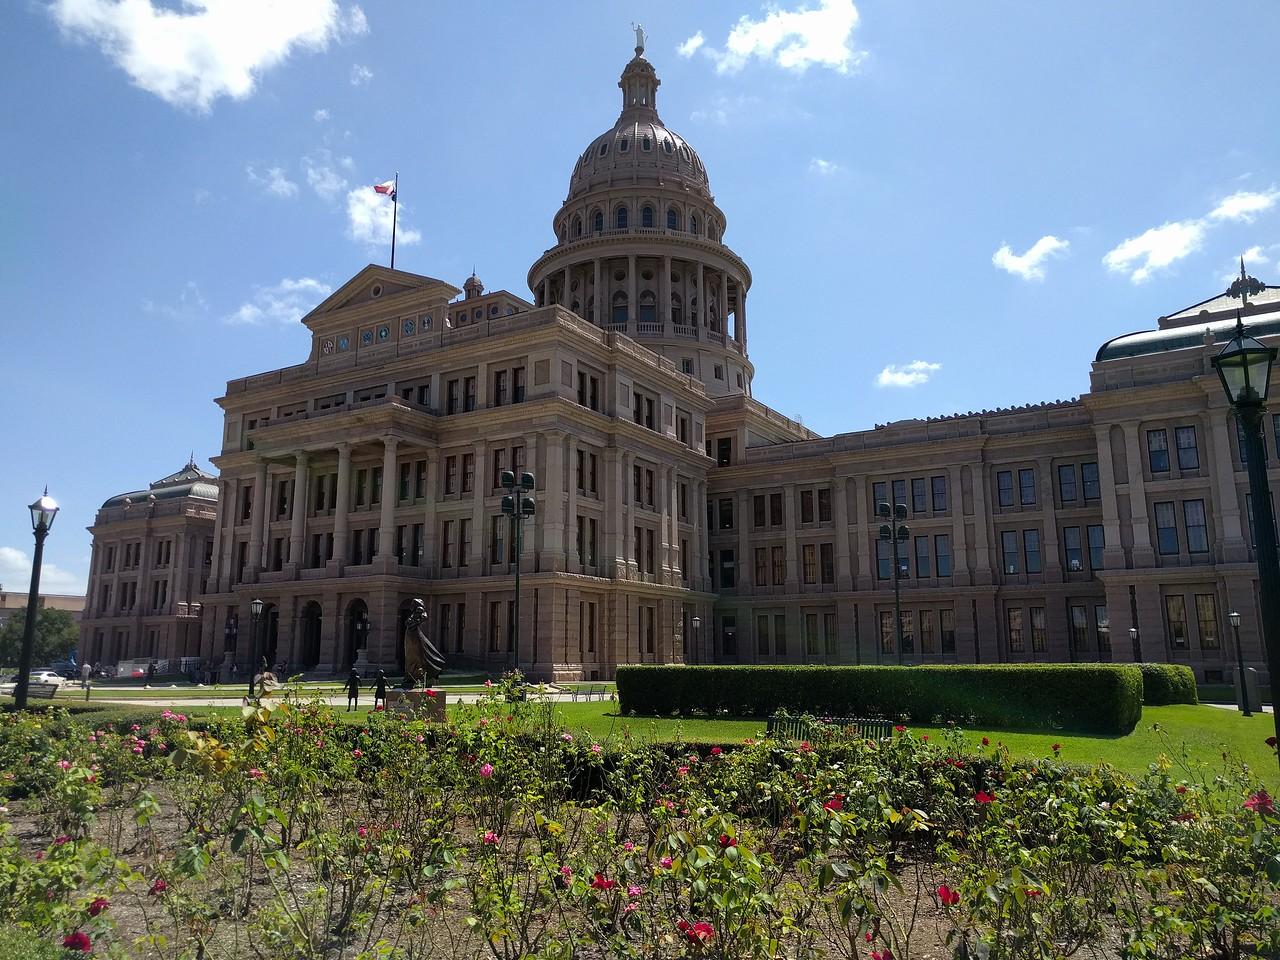 079 - Austin - Capitol Building North Facade